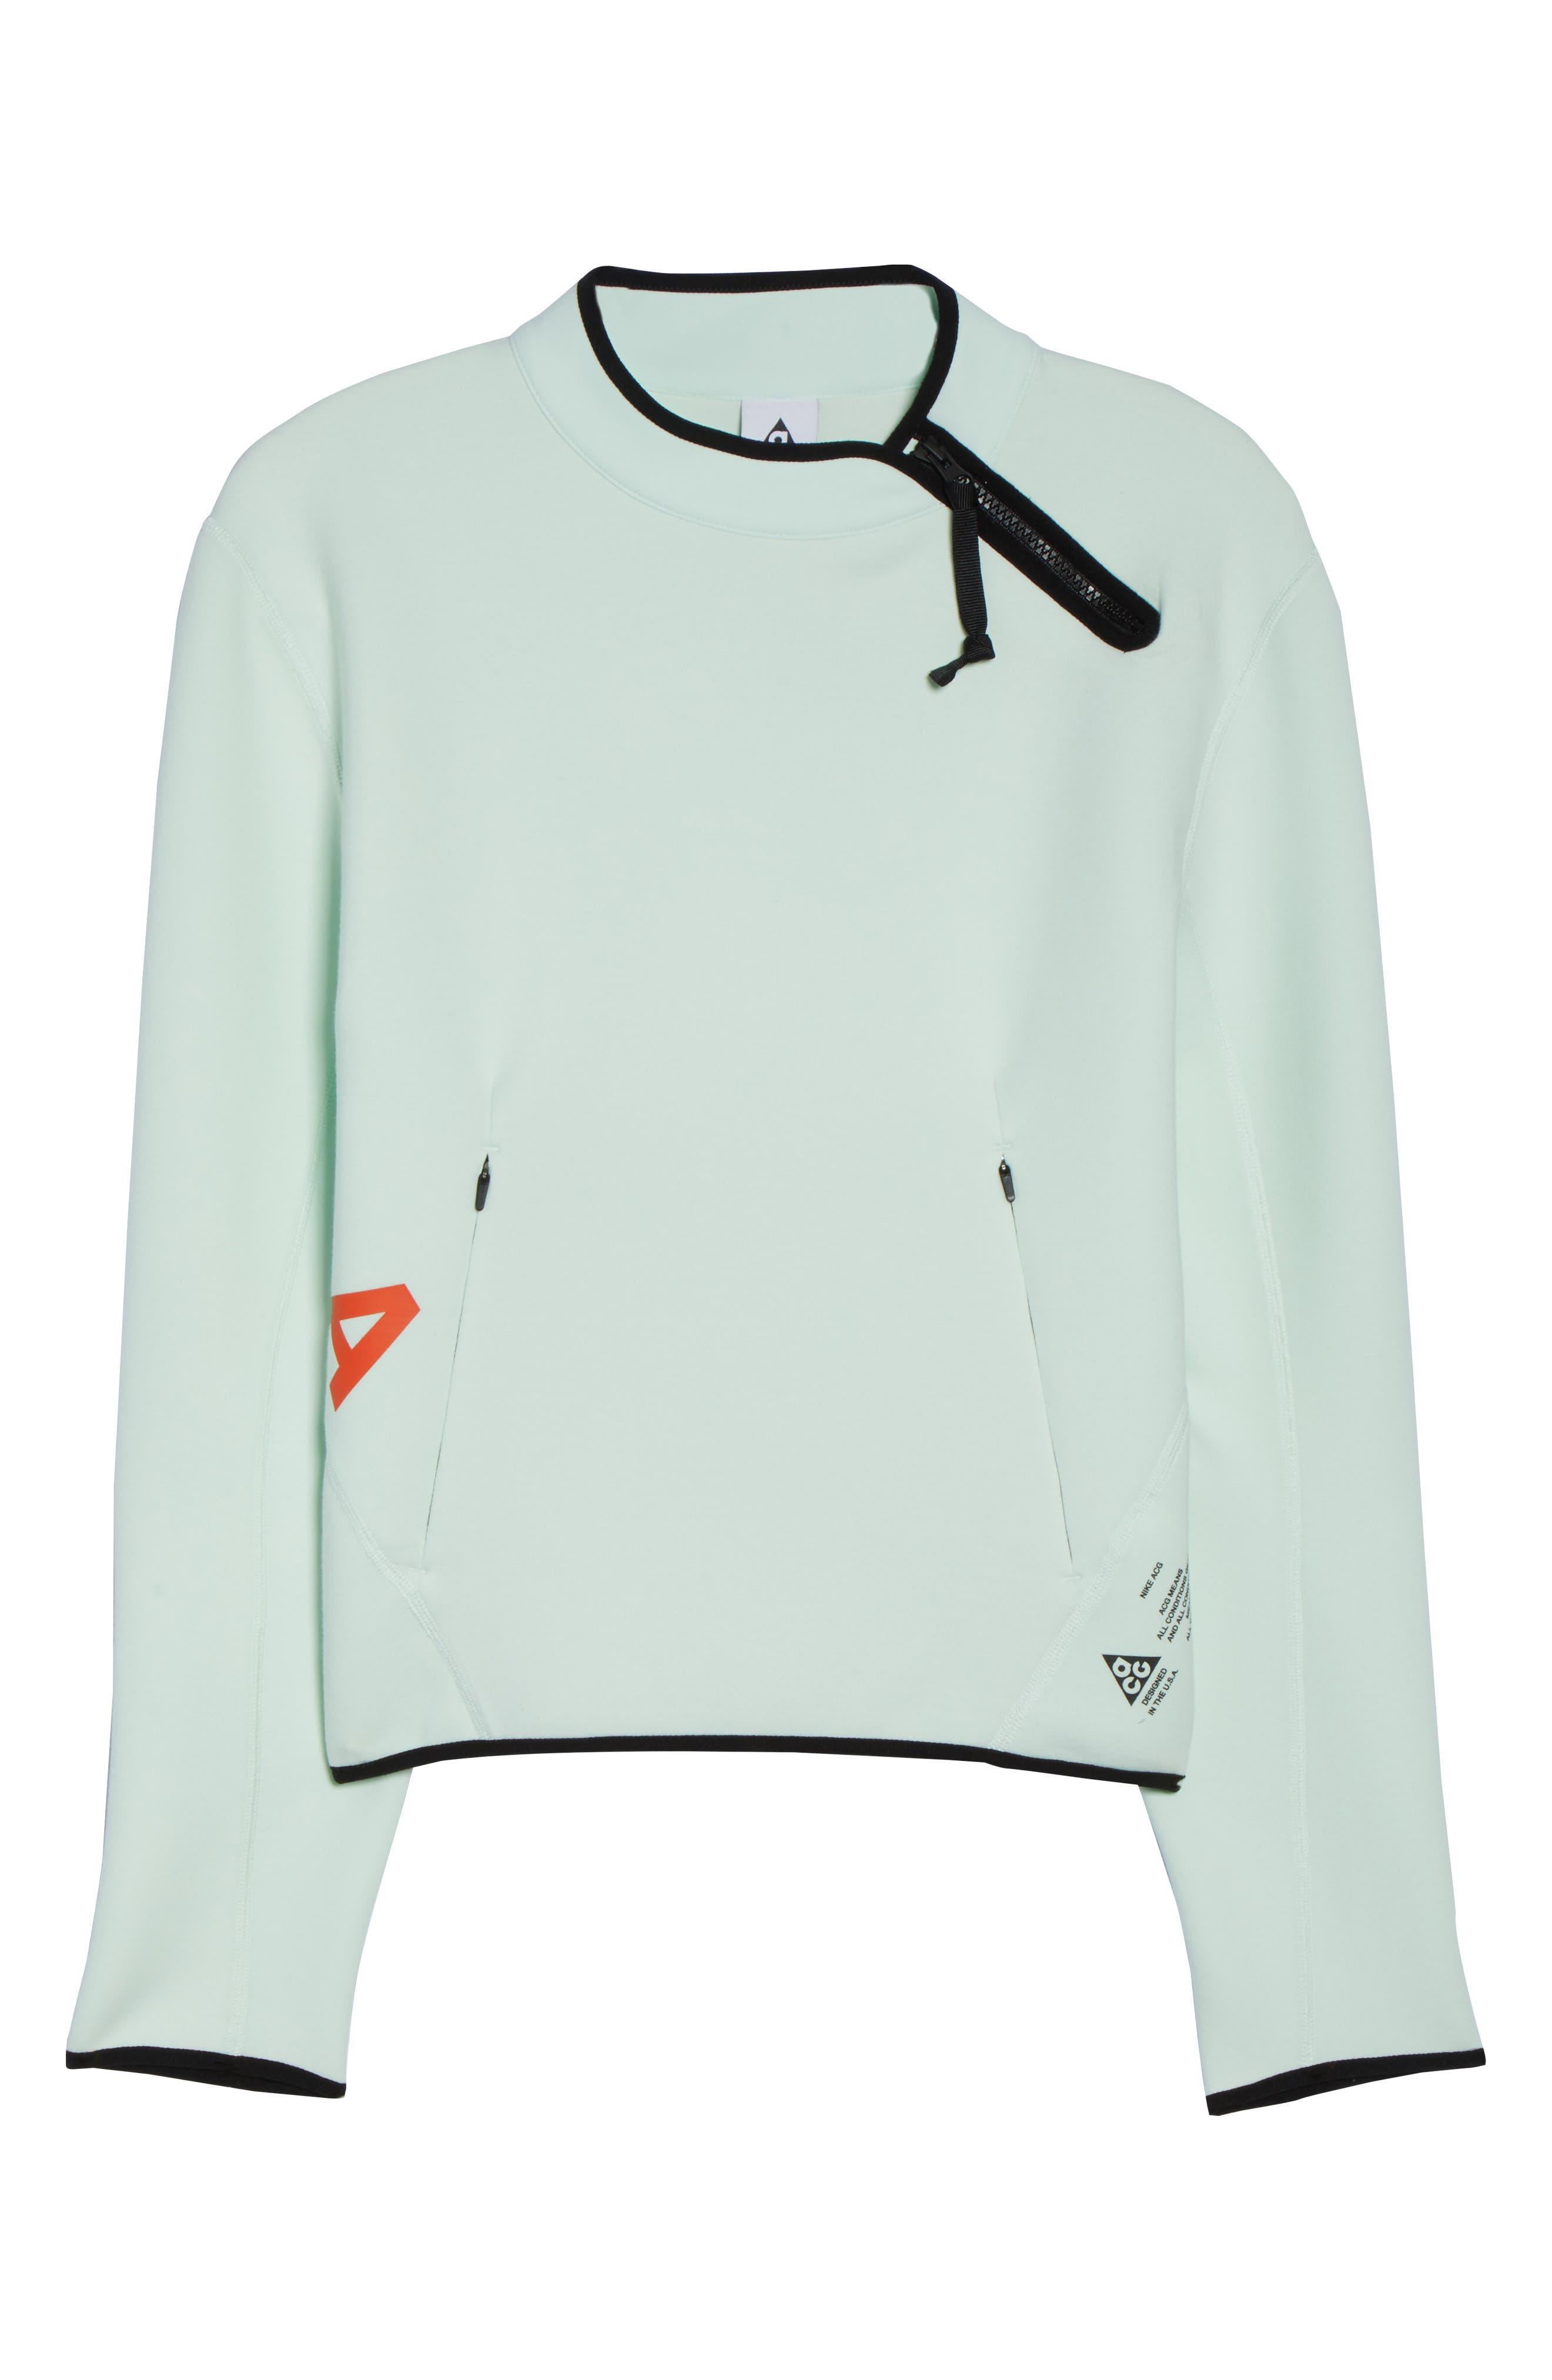 NikeLab ACG Fleece Women's Crewneck Top,                             Alternate thumbnail 7, color,                             Barely Green/ Team Orange